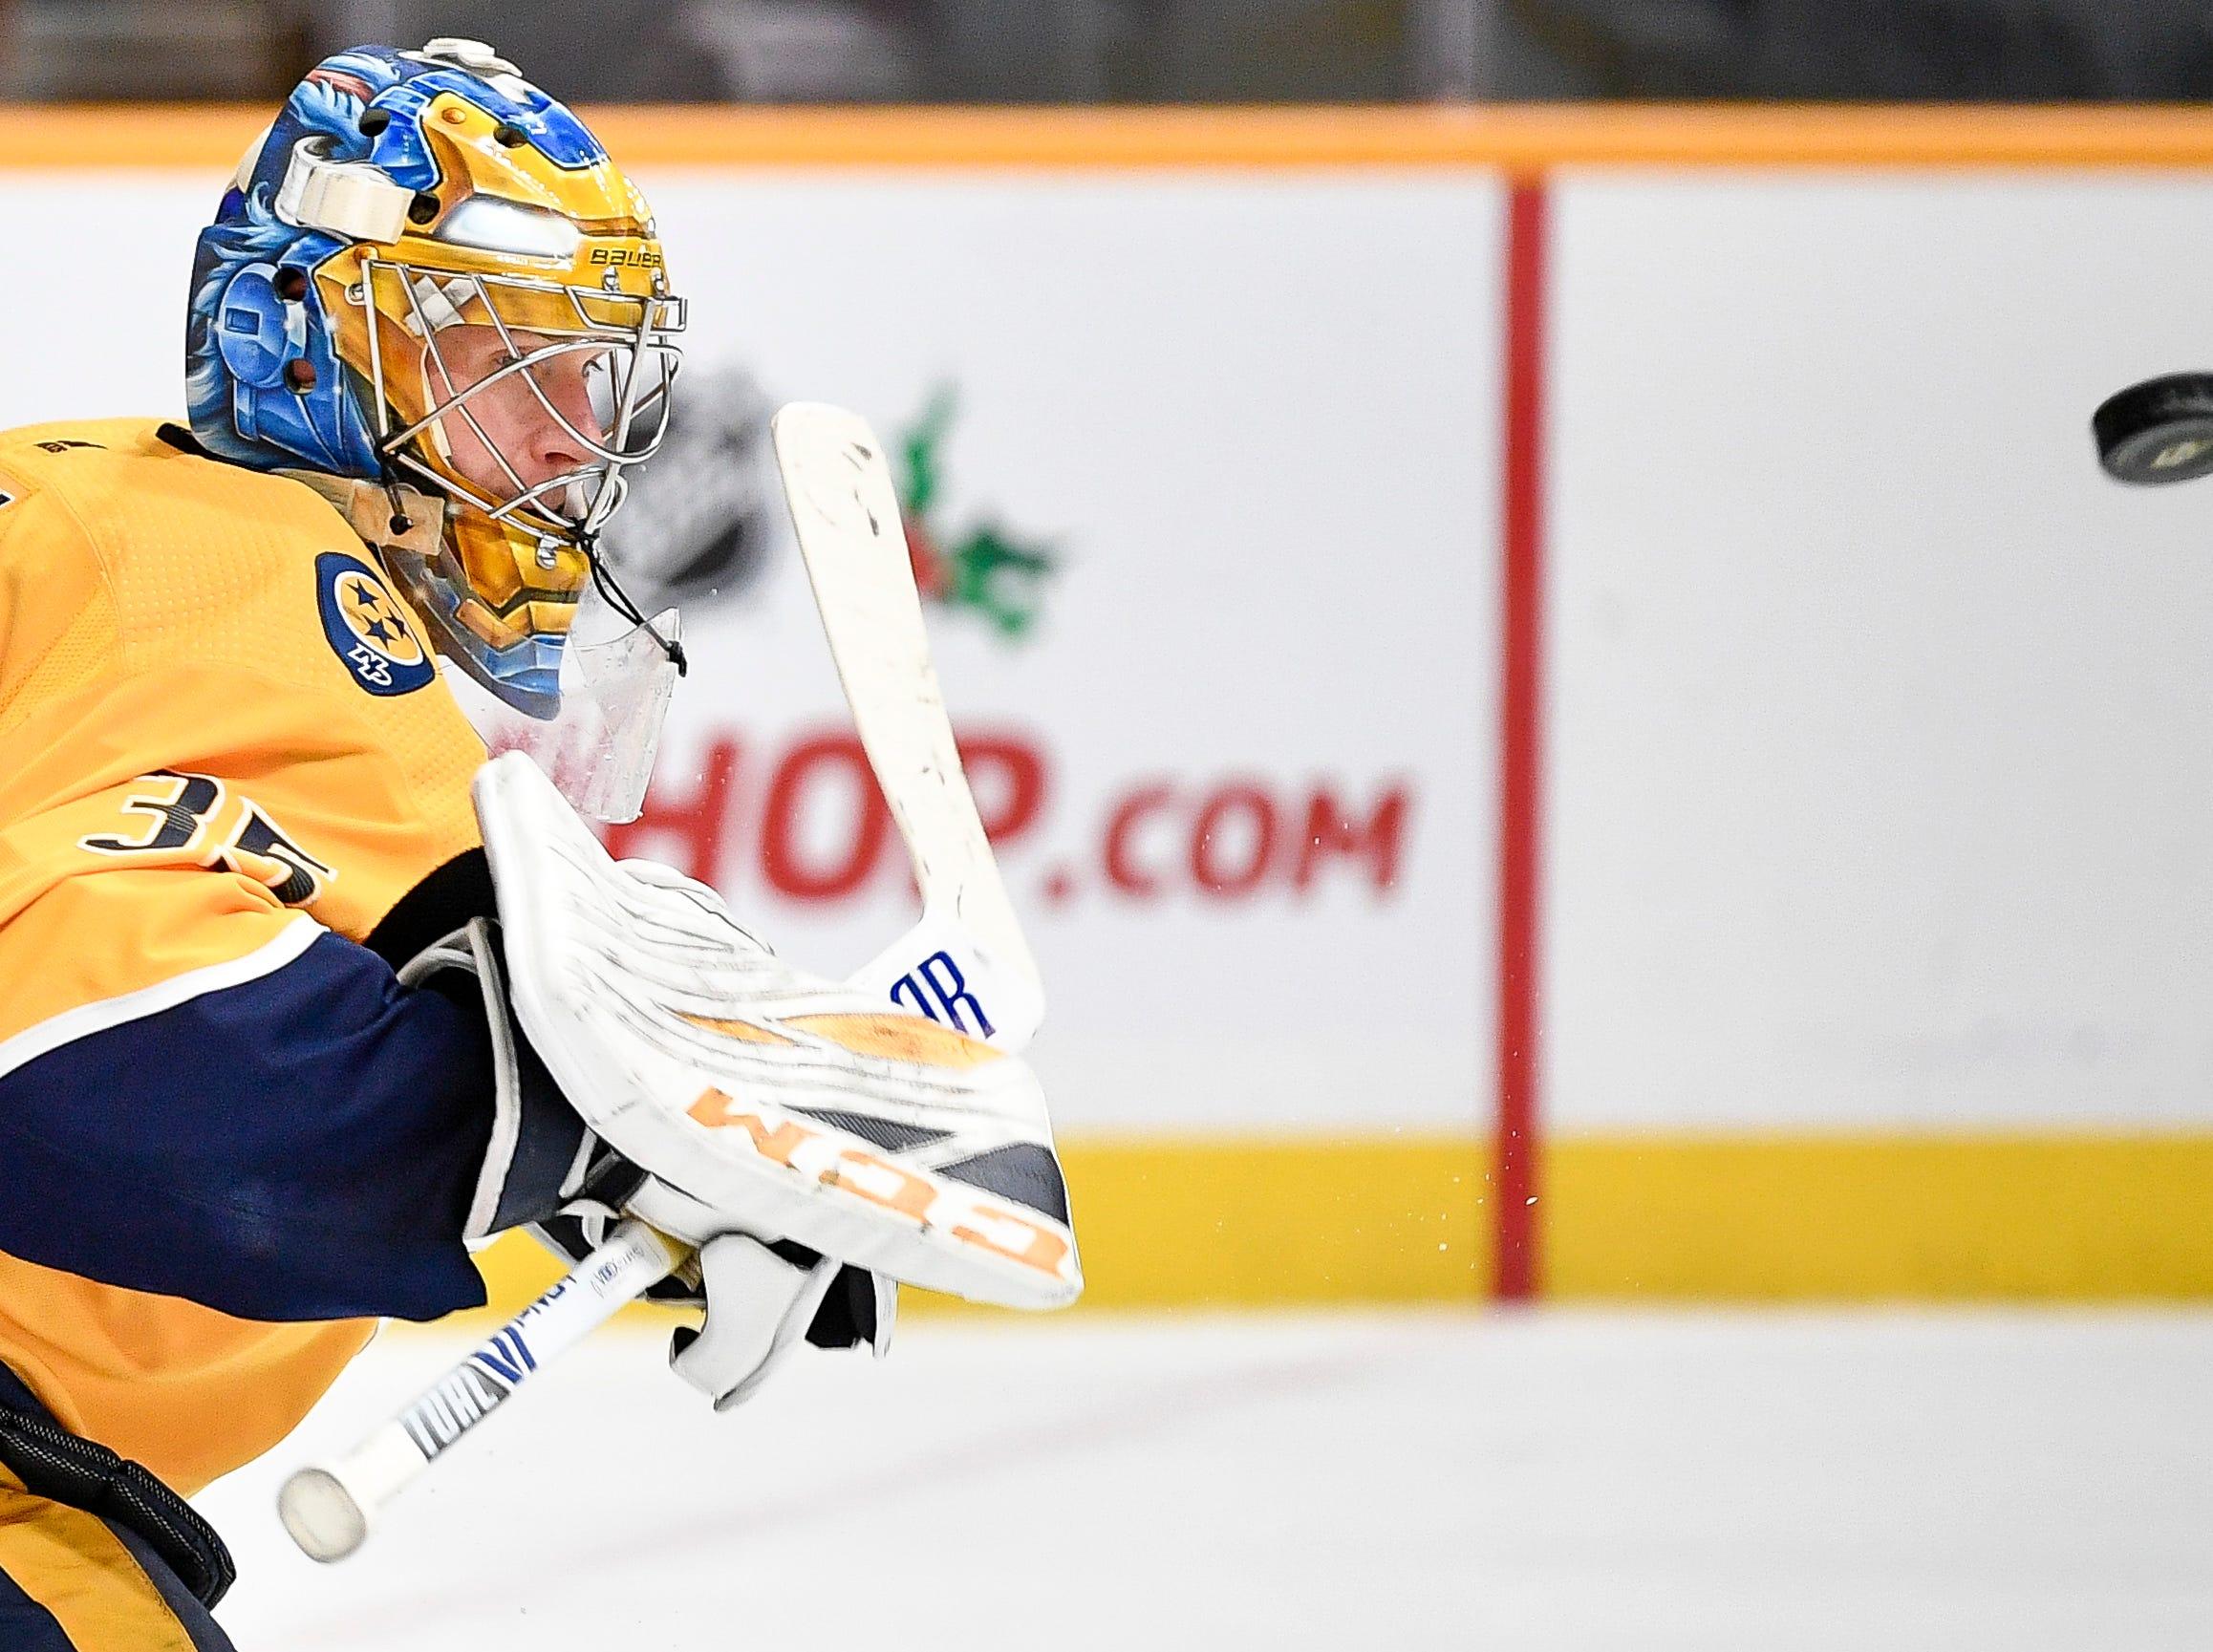 Nashville Predators goaltender Pekka Rinne (35) stops an Ottawa Senators shot during the second period at Bridgestone Arena in Nashville, Tenn., Tuesday, Dec. 11, 2018.